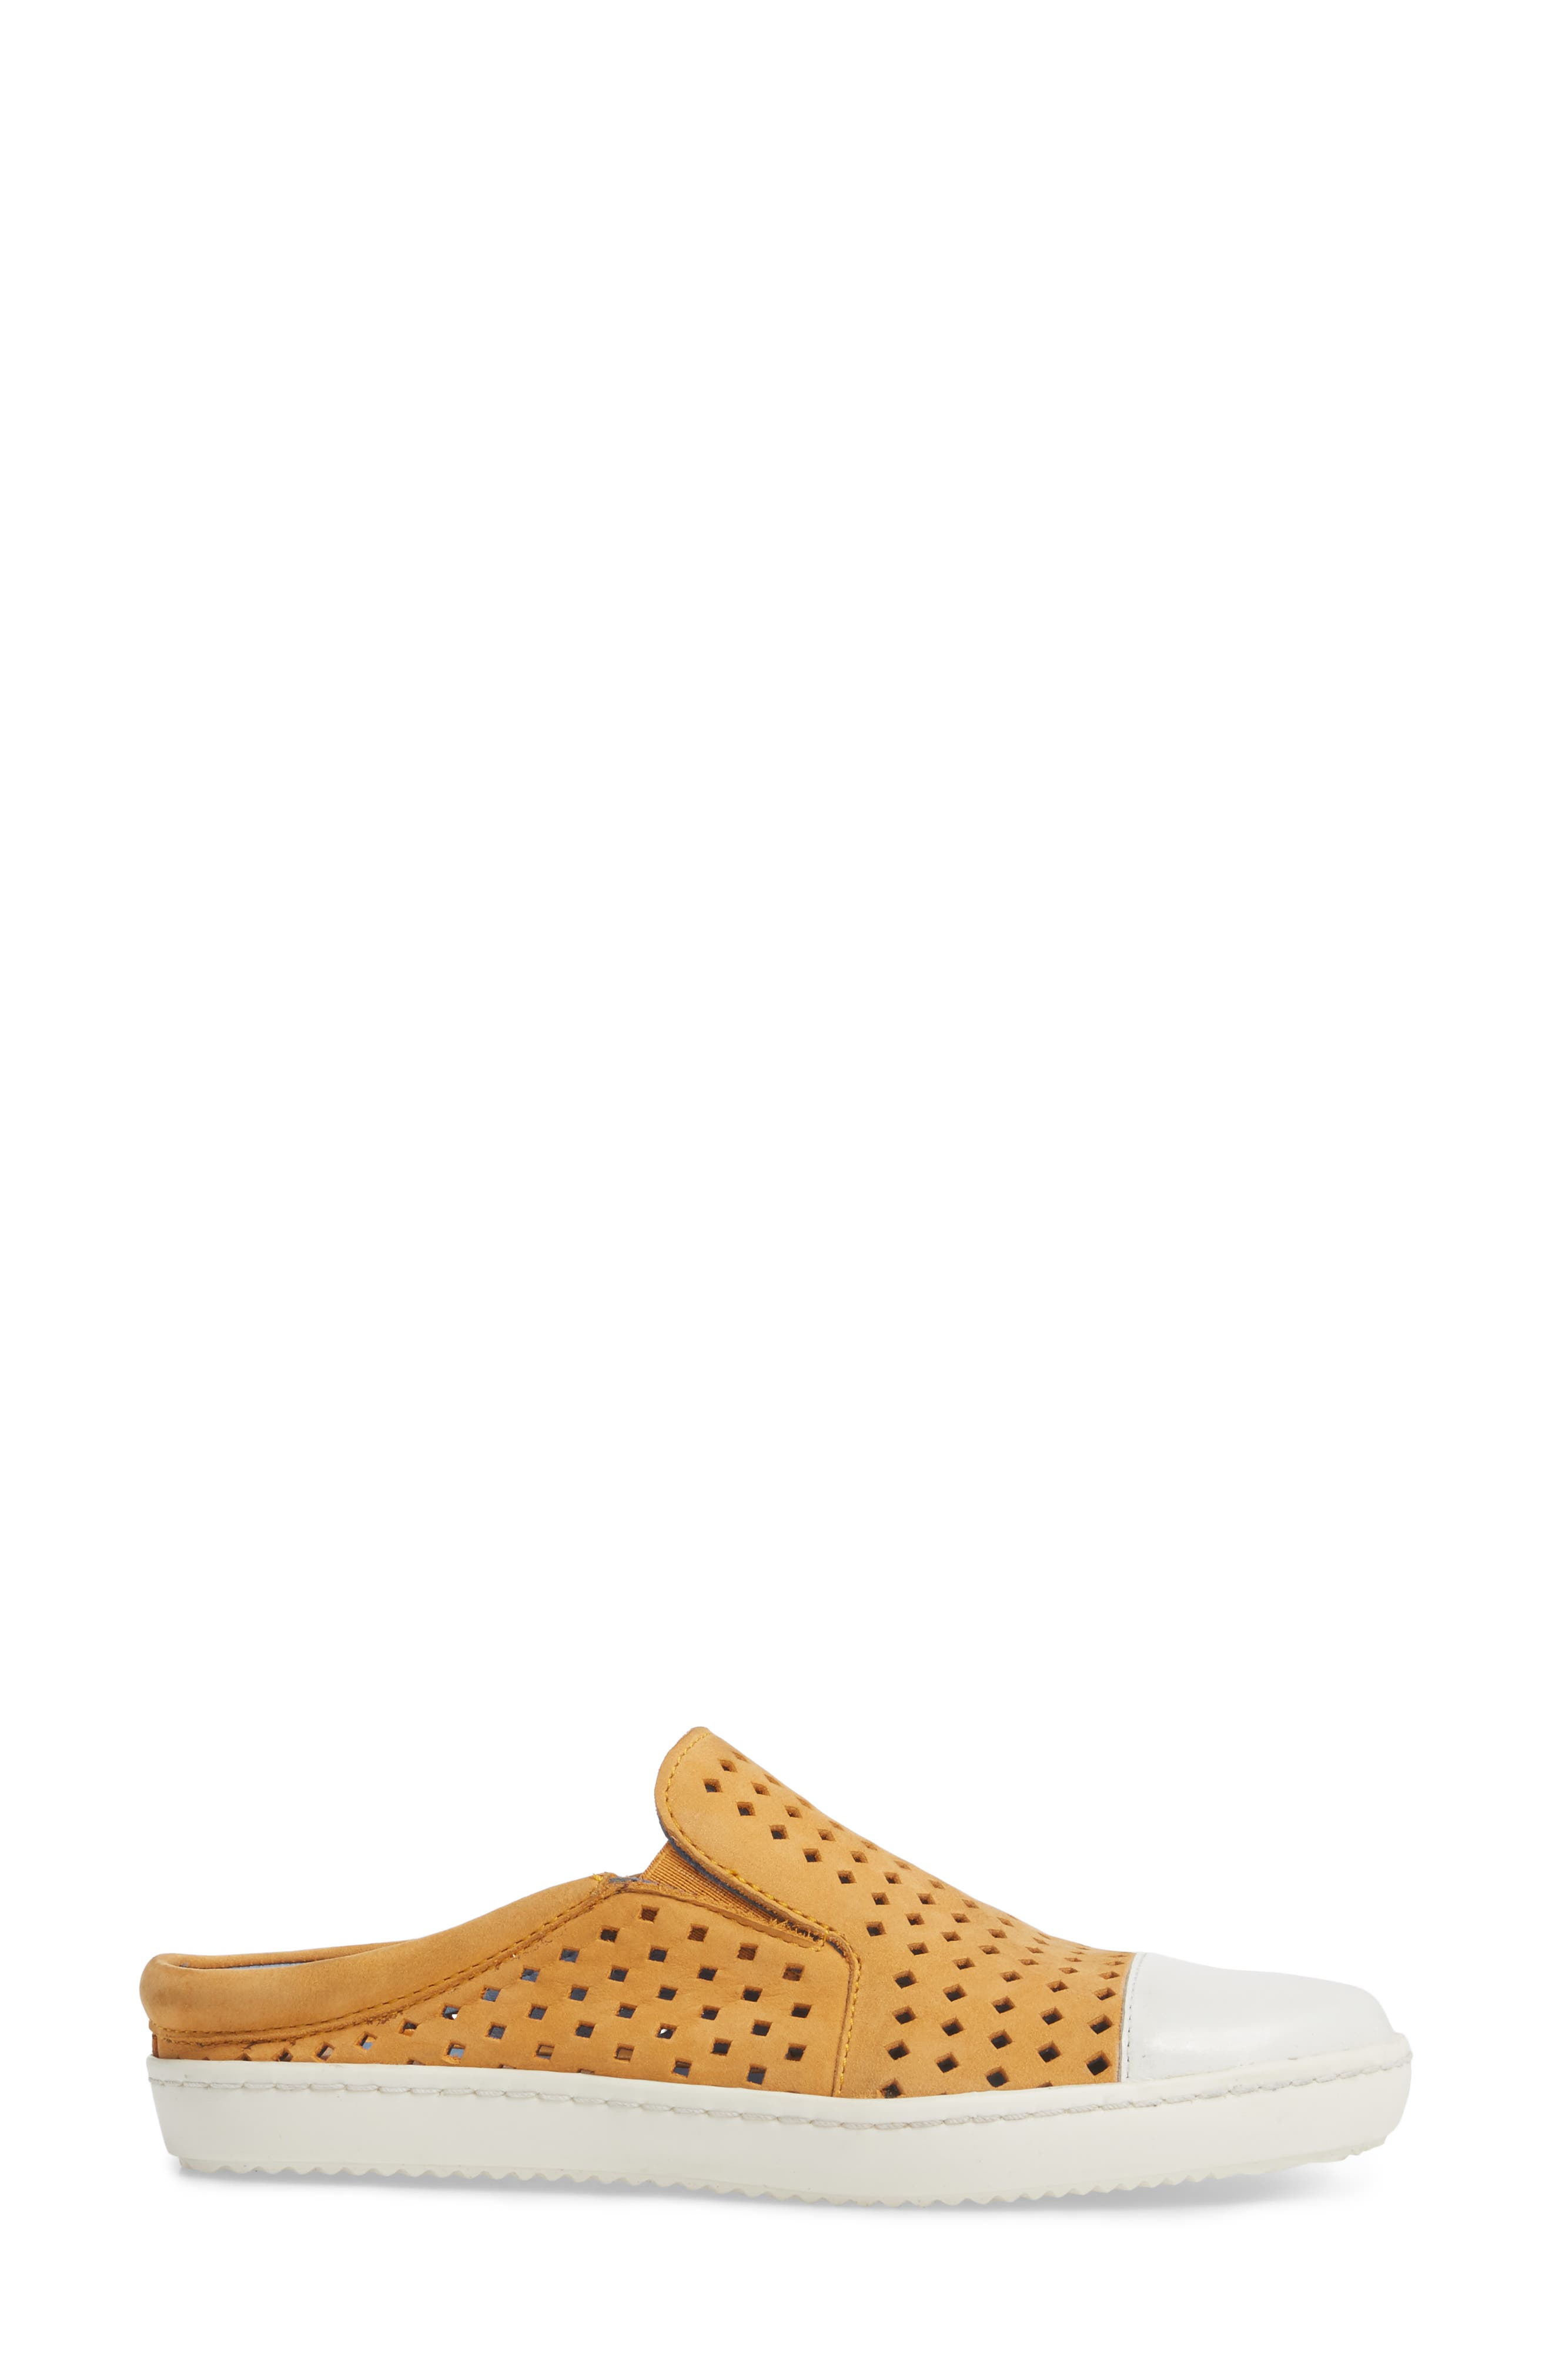 Tippy Slip-On Sneaker,                             Alternate thumbnail 3, color,                             Saffon Suede